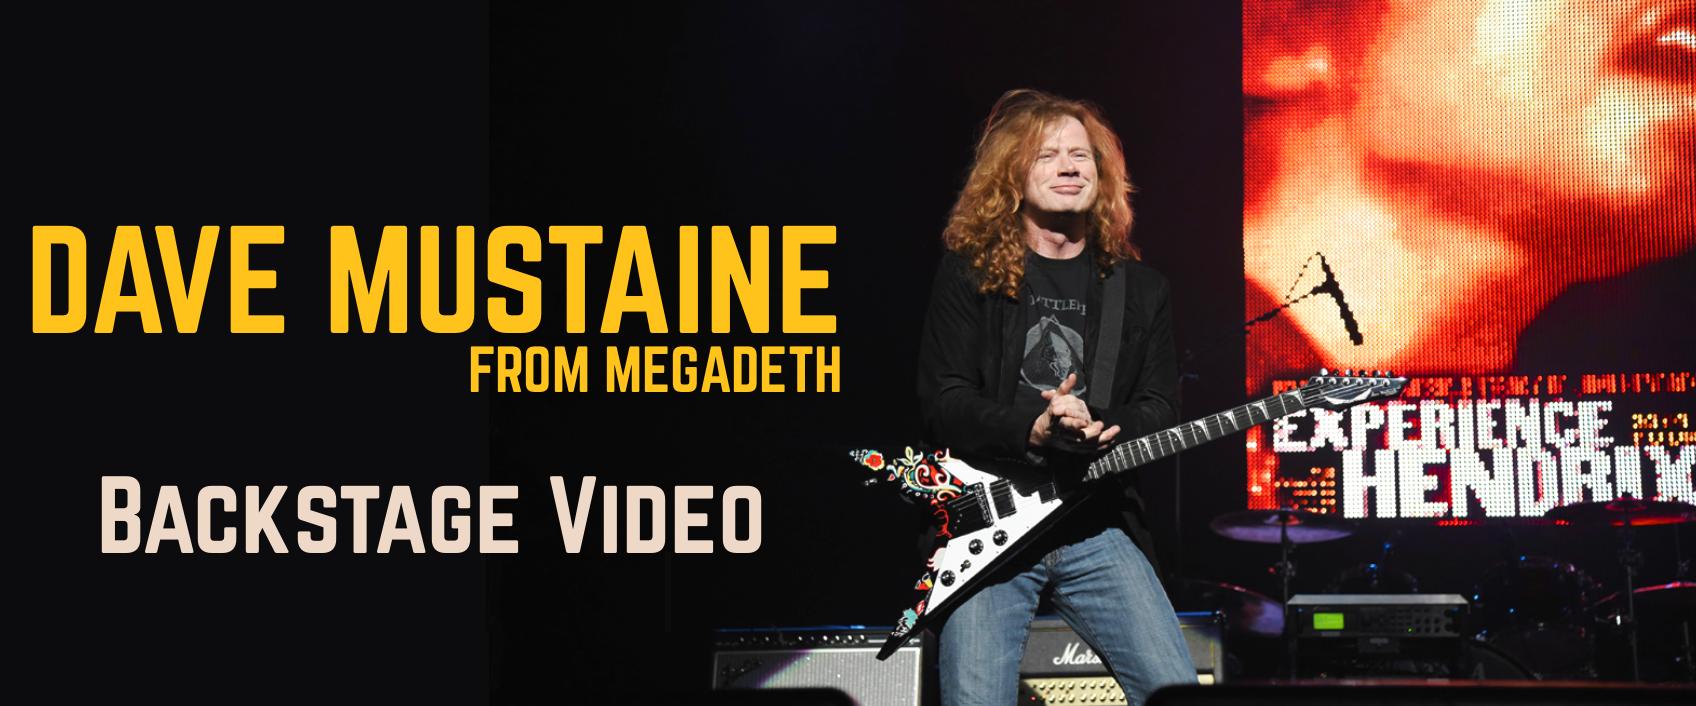 En coulisse avec Dave Mustaine du groupe Megadeth